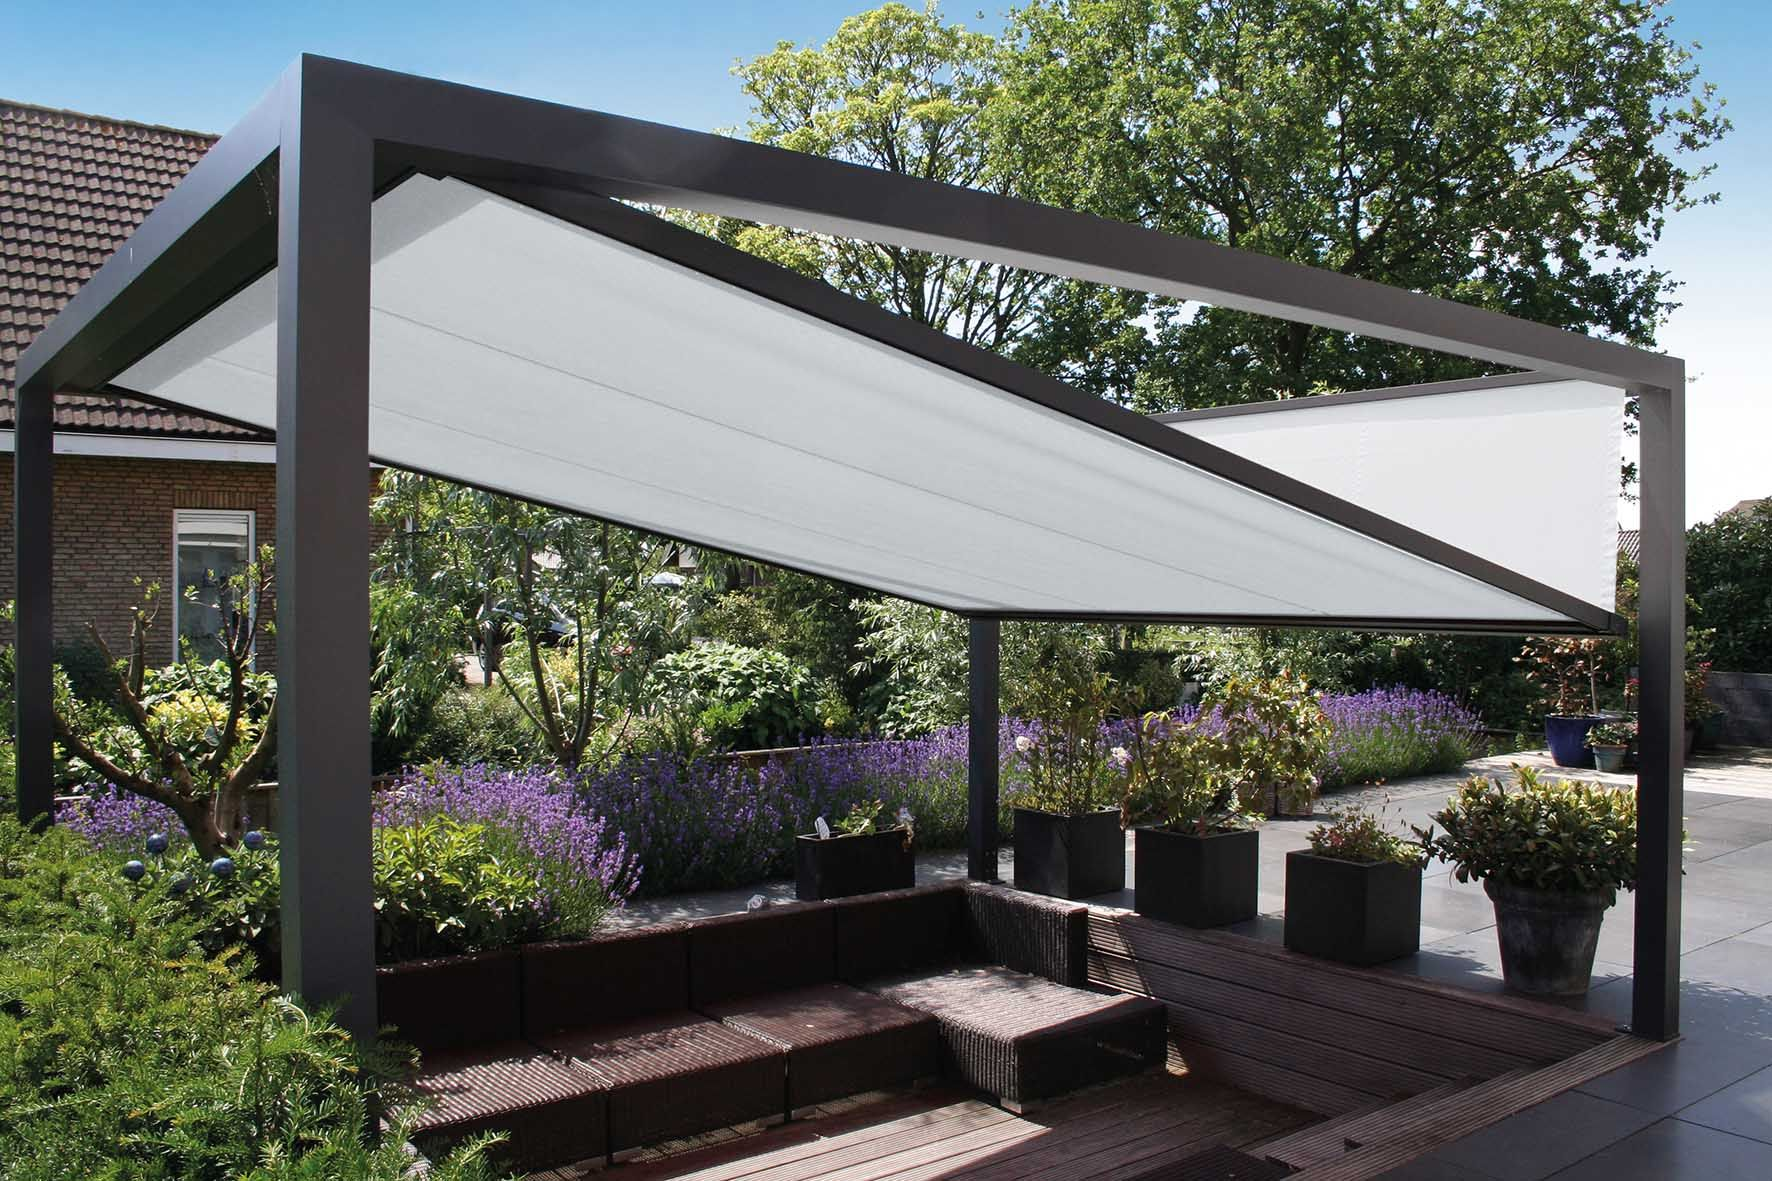 Sonnenschutzanlage Fur Terrassen Terassenideen Pergola Design Hinterhof